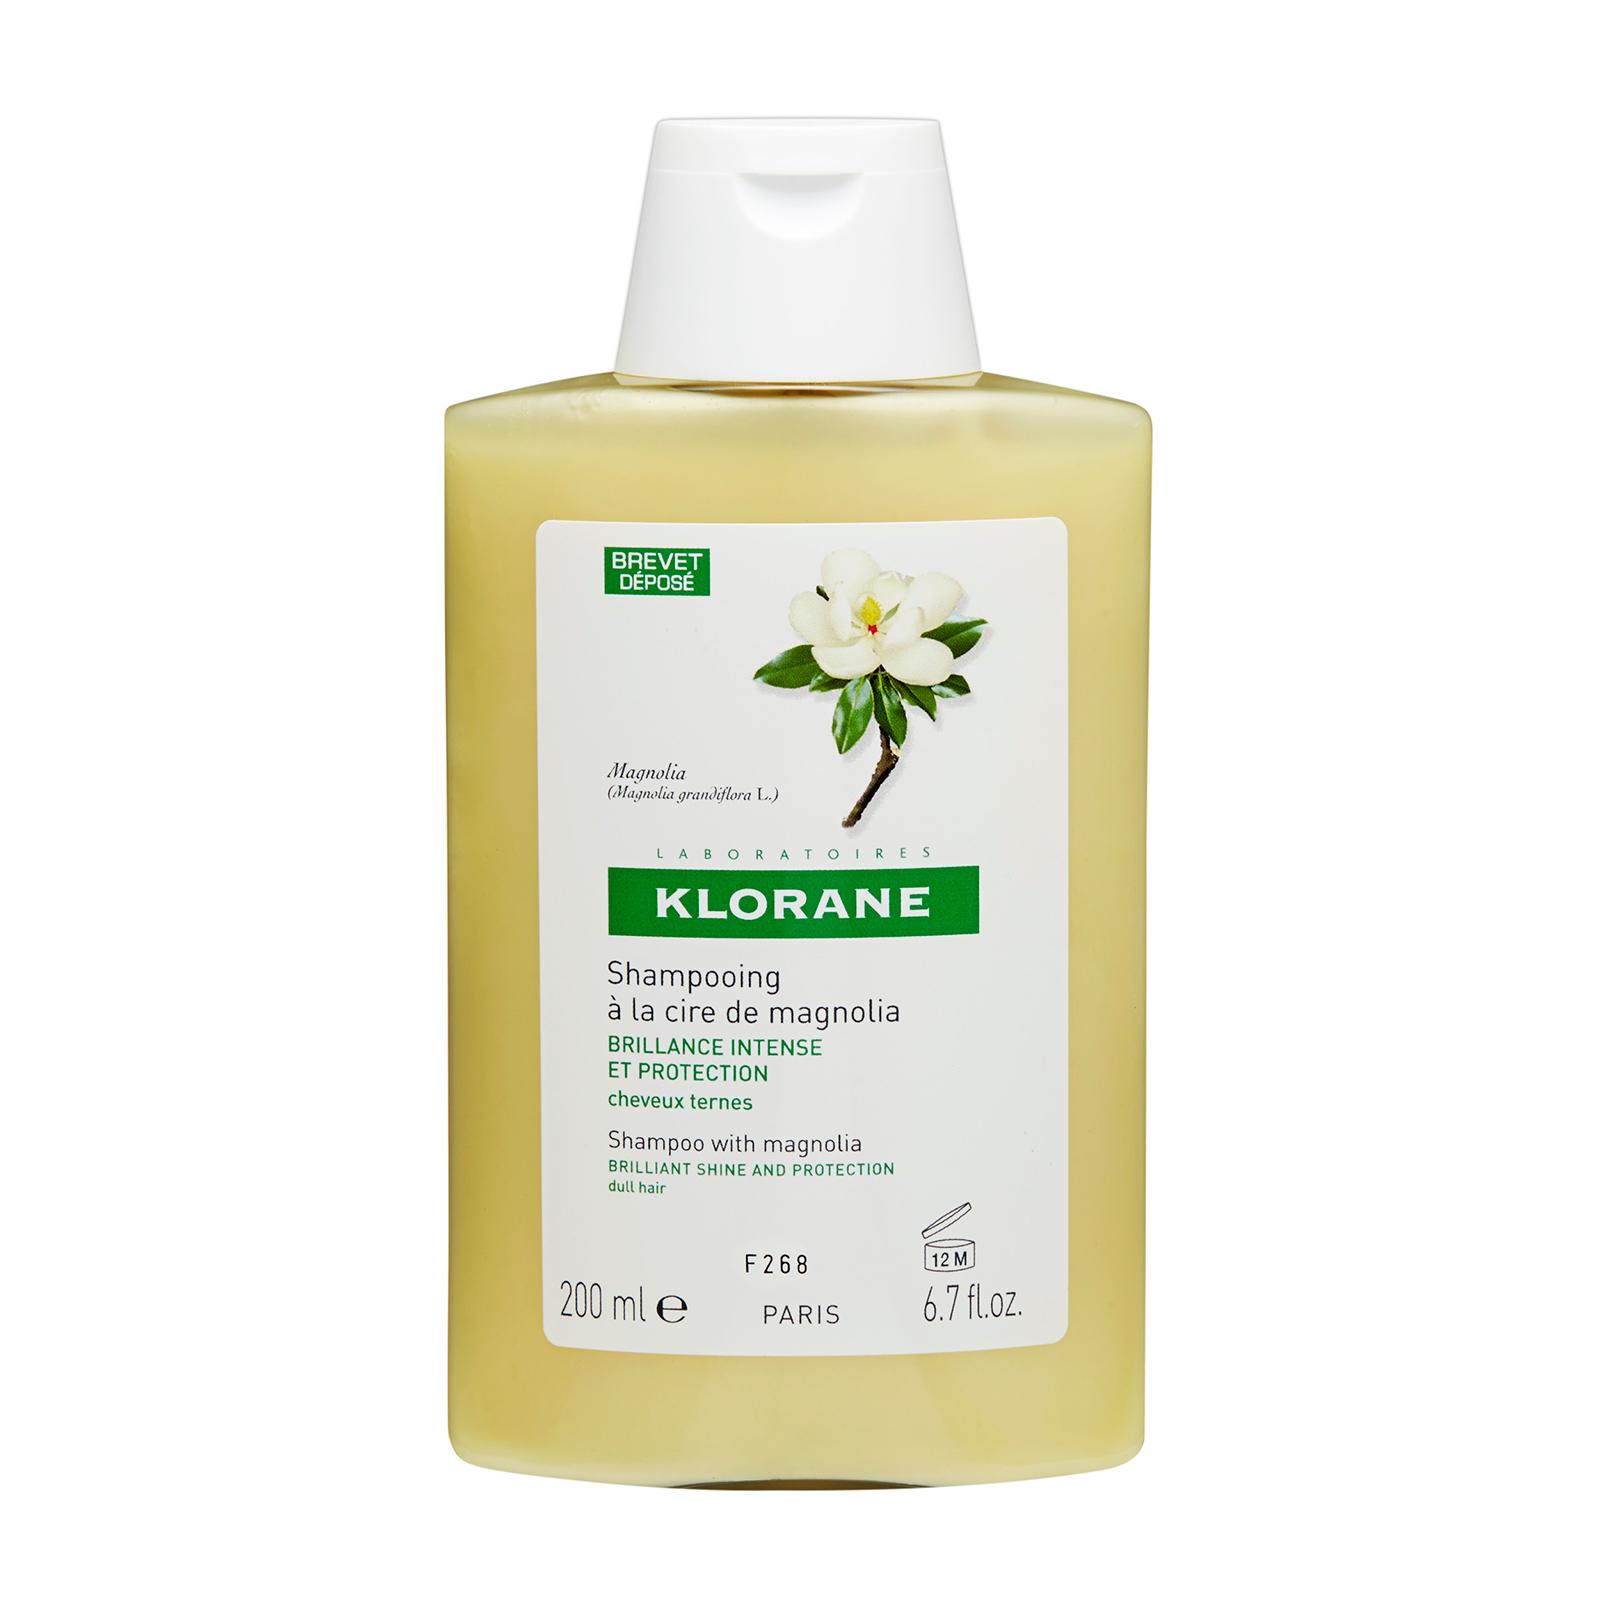 Klorane  Shampoo With Magnolia - Brilliant Shine & Protection (Dull Hair) 6.7oz, 200ml